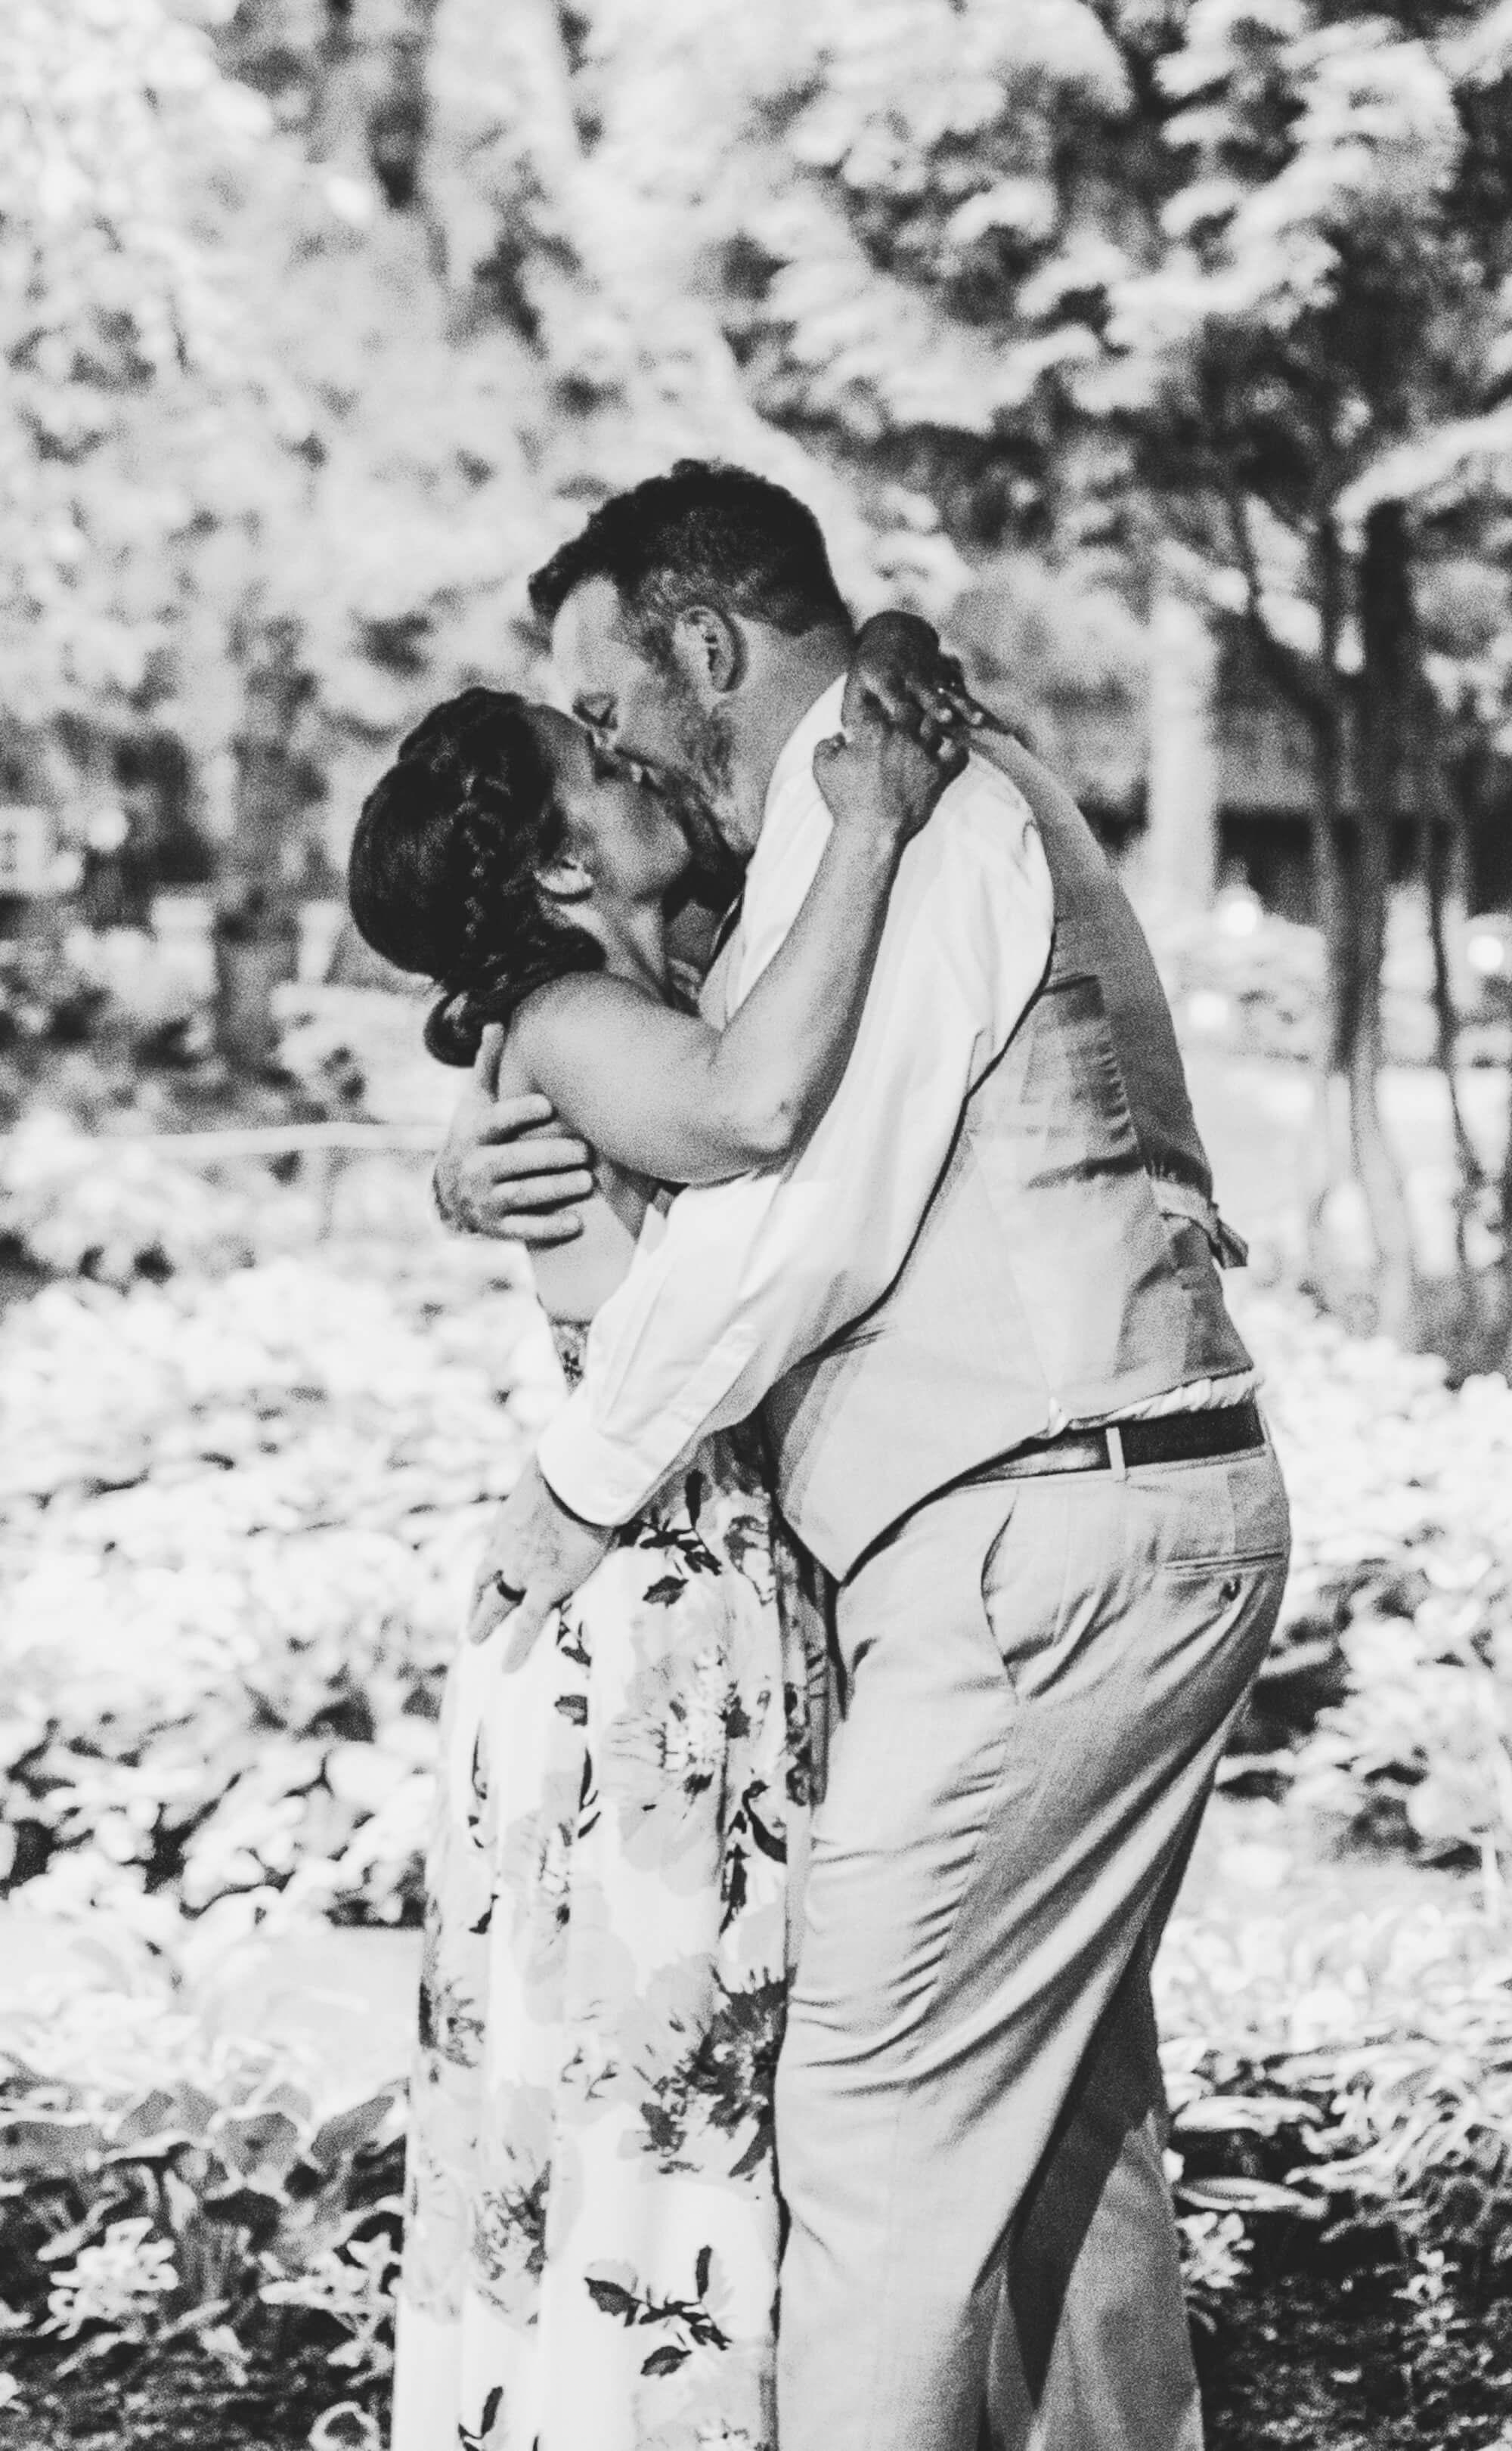 engle-olson-maddy-pat-mn-wedding-photography-21.jpg